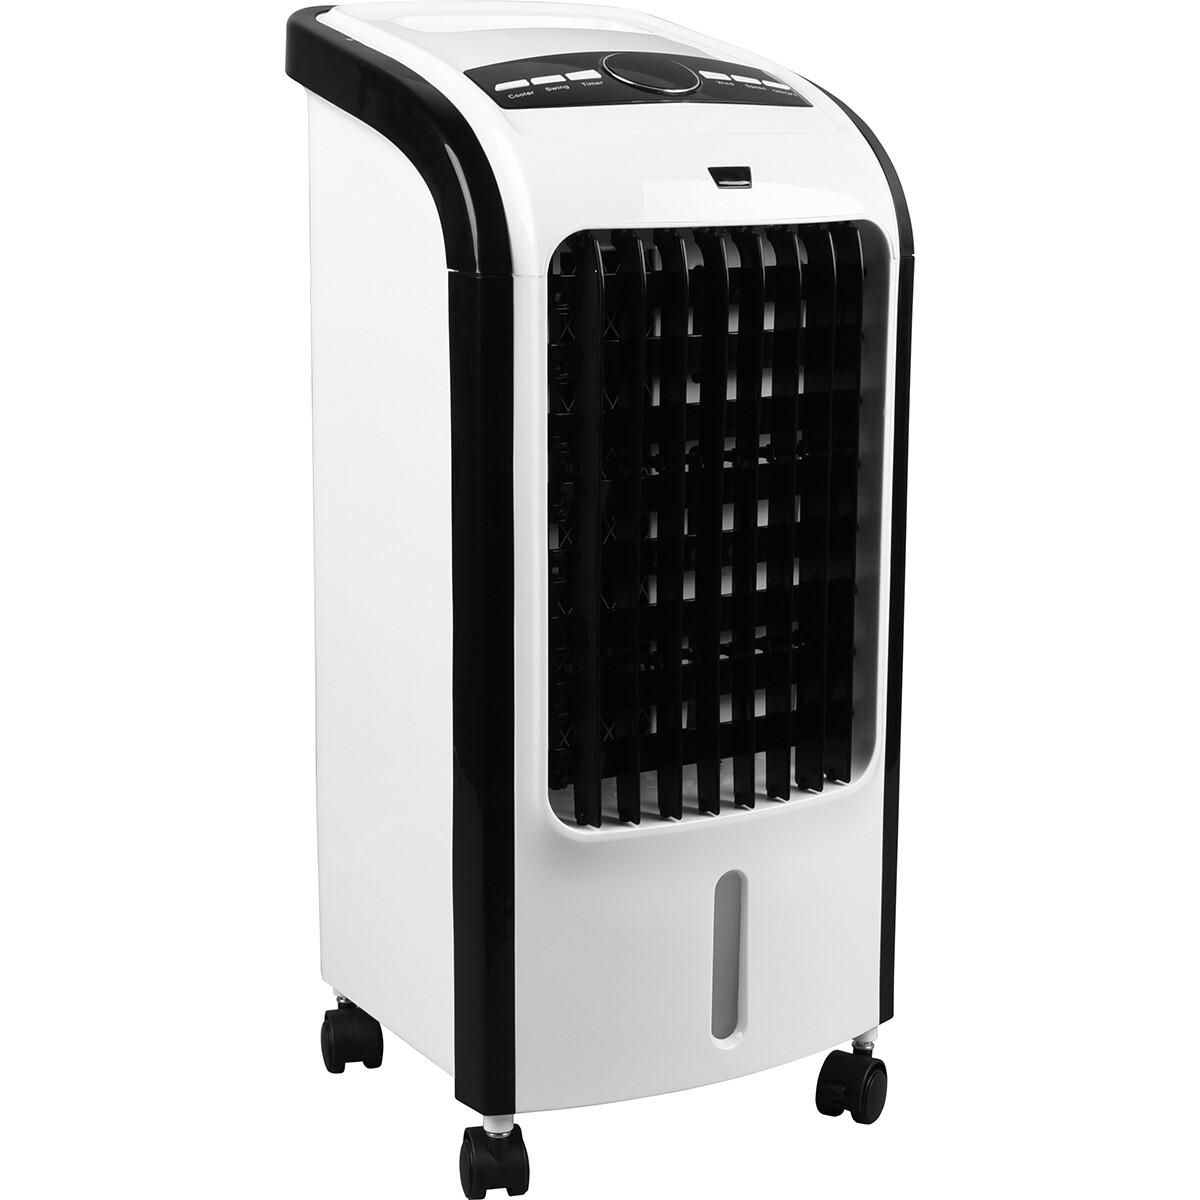 Luchtkoeler - Air Cooler - Luchtbevochtiger - Trion Ispal - Afstandsbediening - Timer - 7 Liter - Ma